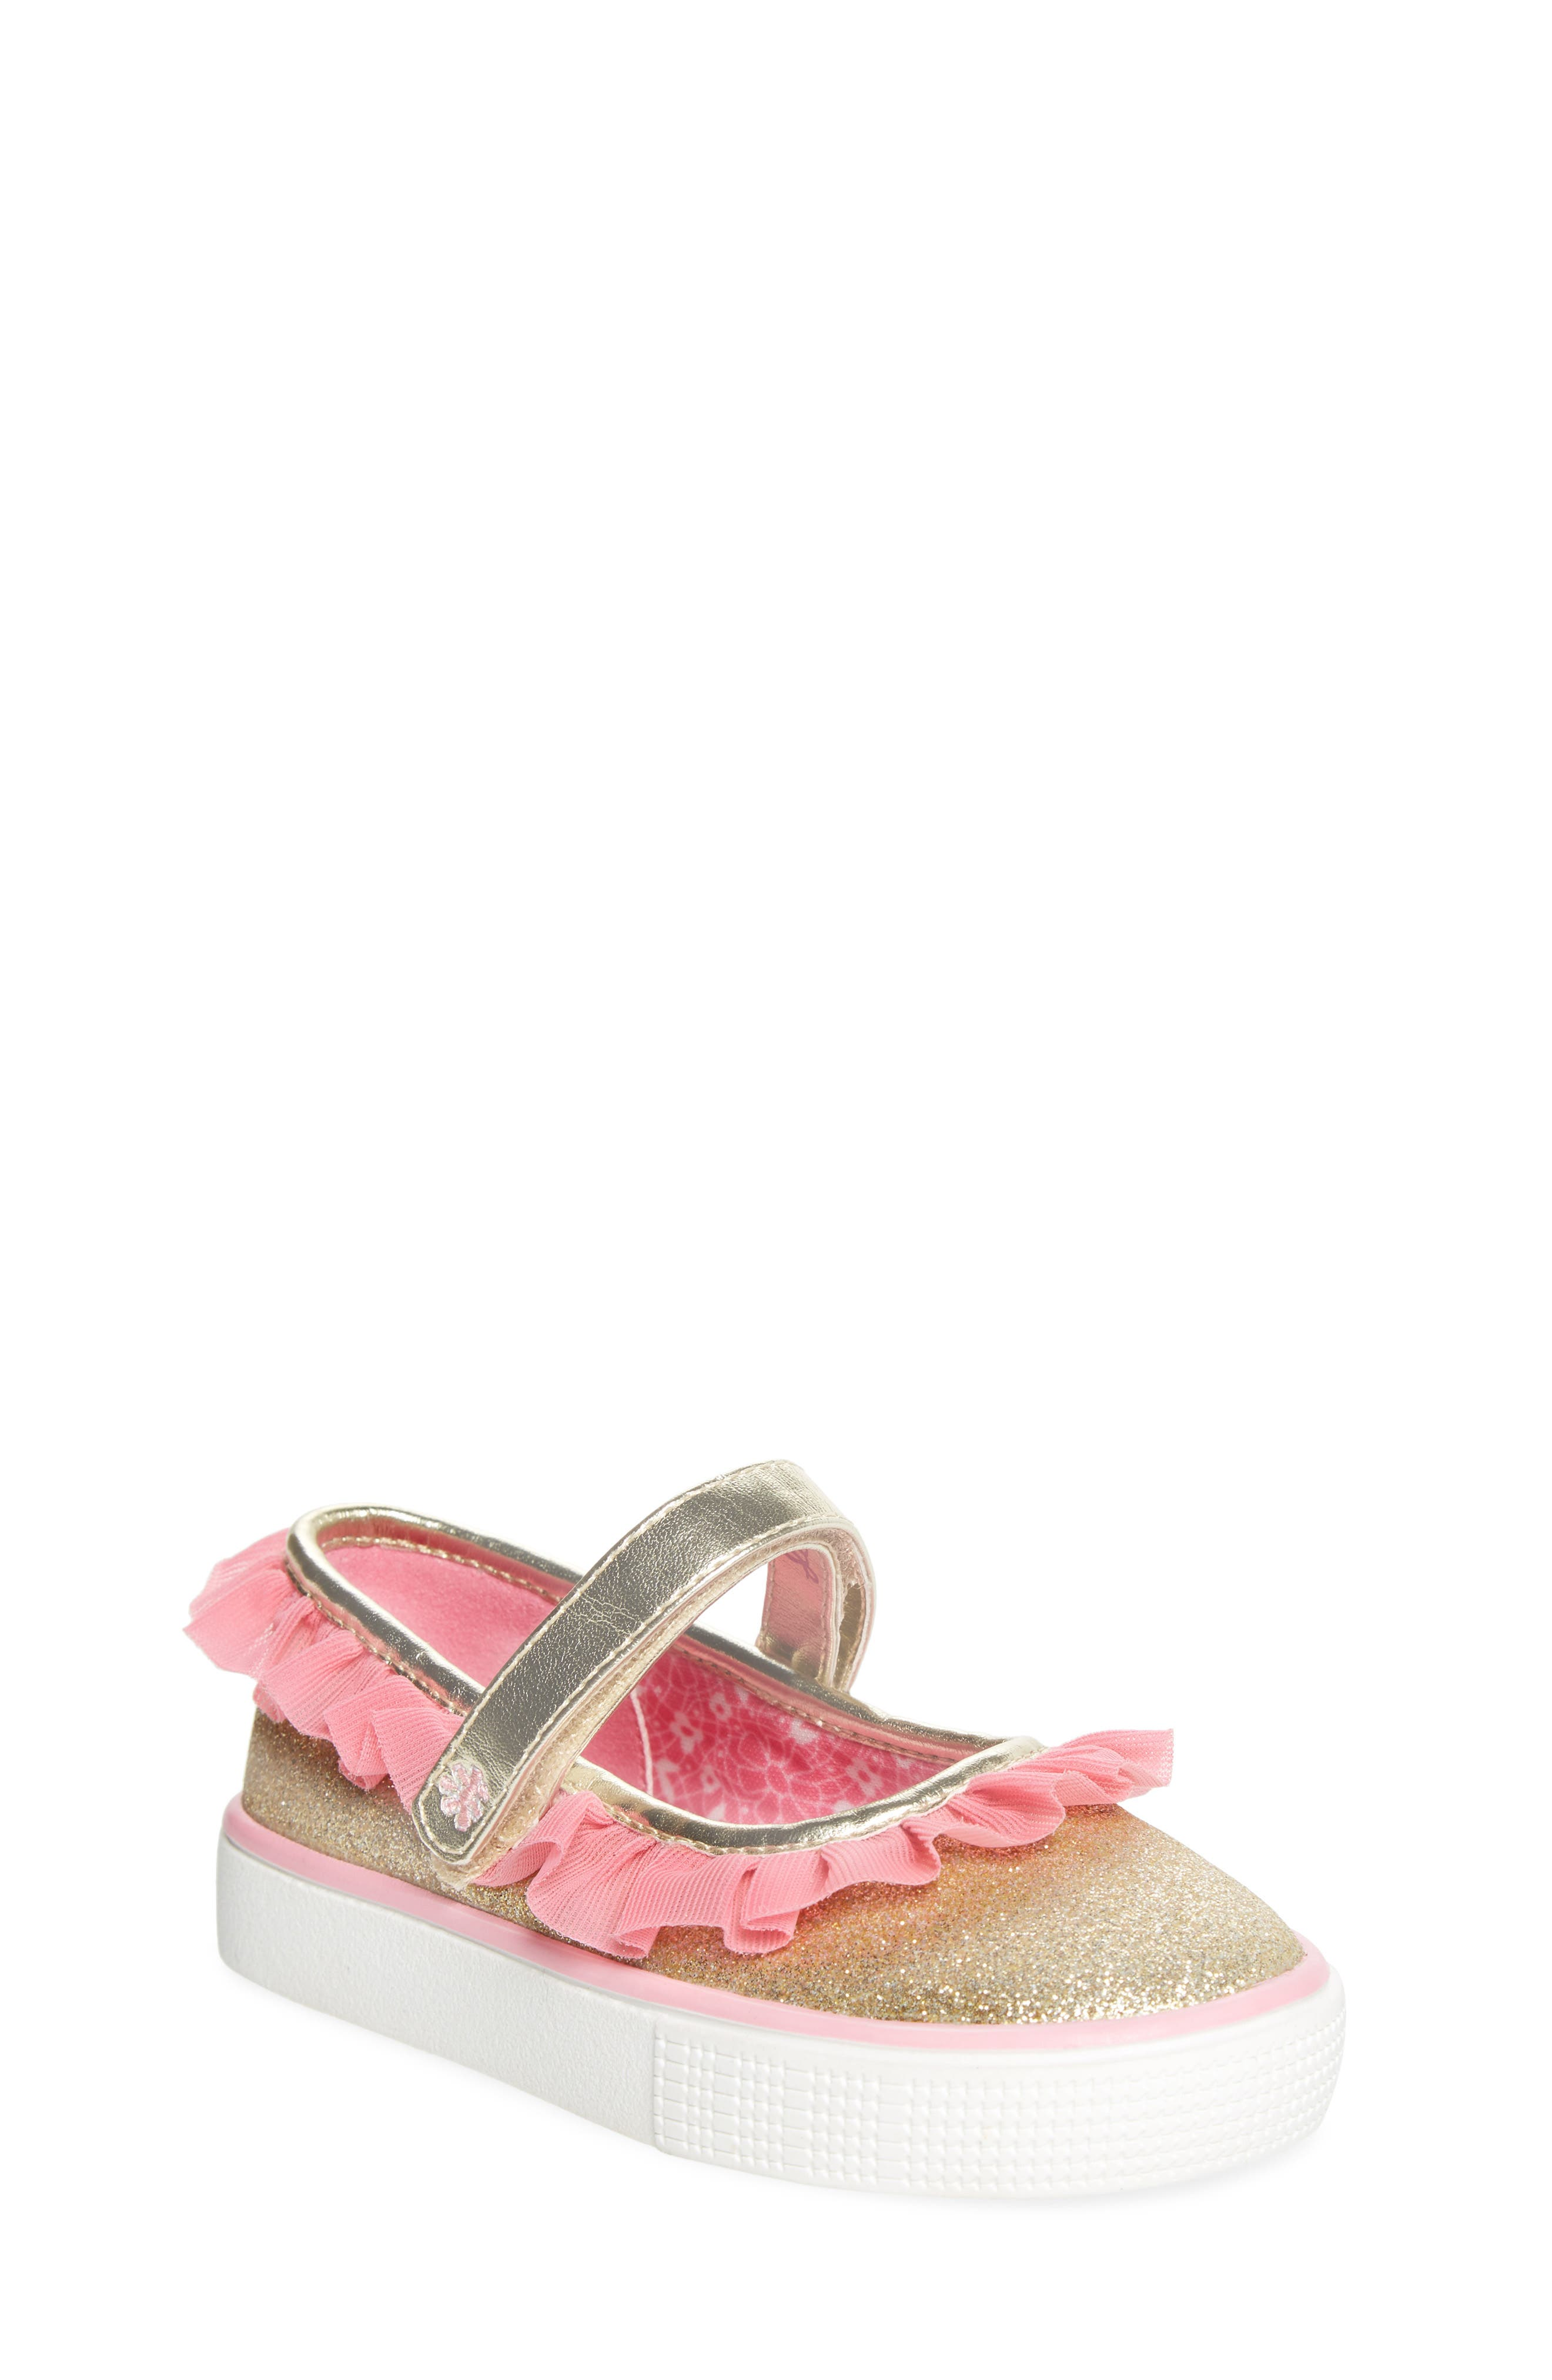 Ashlyn Tulle Mary Jane Sneaker,                             Main thumbnail 1, color,                             710